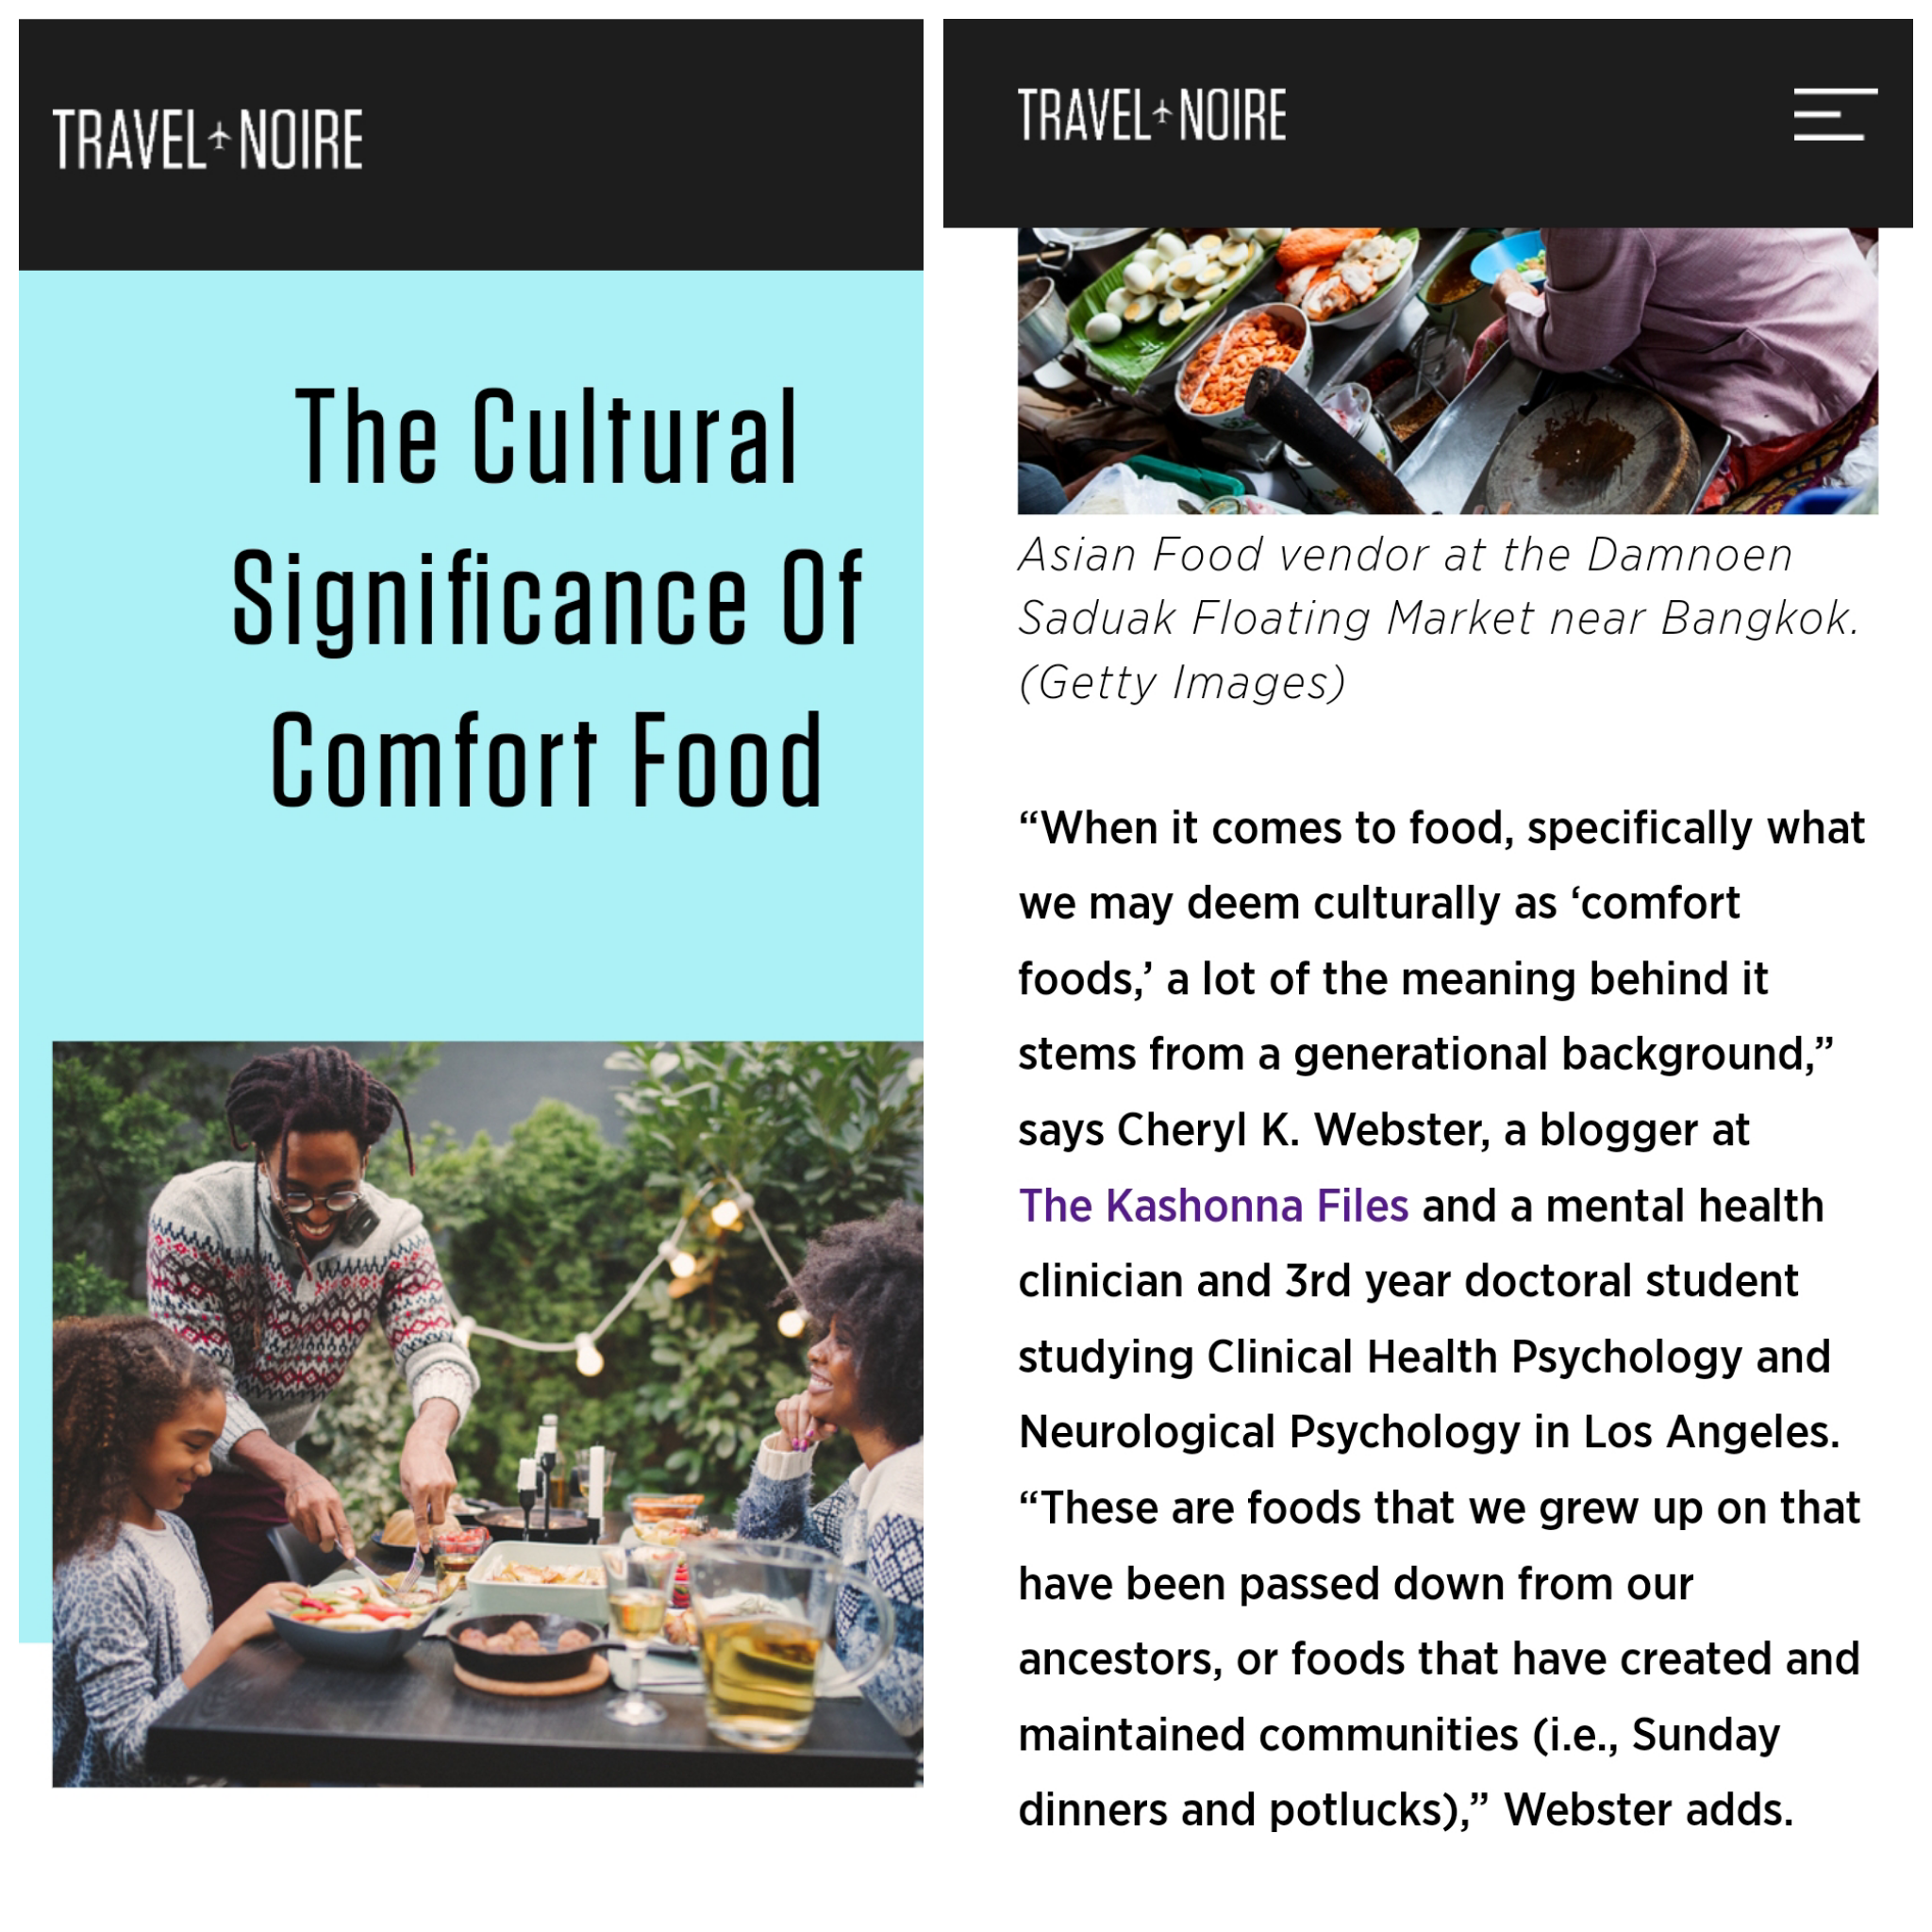 TRAVEL NOIRE MENTAL HEALTH FEATURE |  www.travelnoire.com/culturalsignificanceoffood